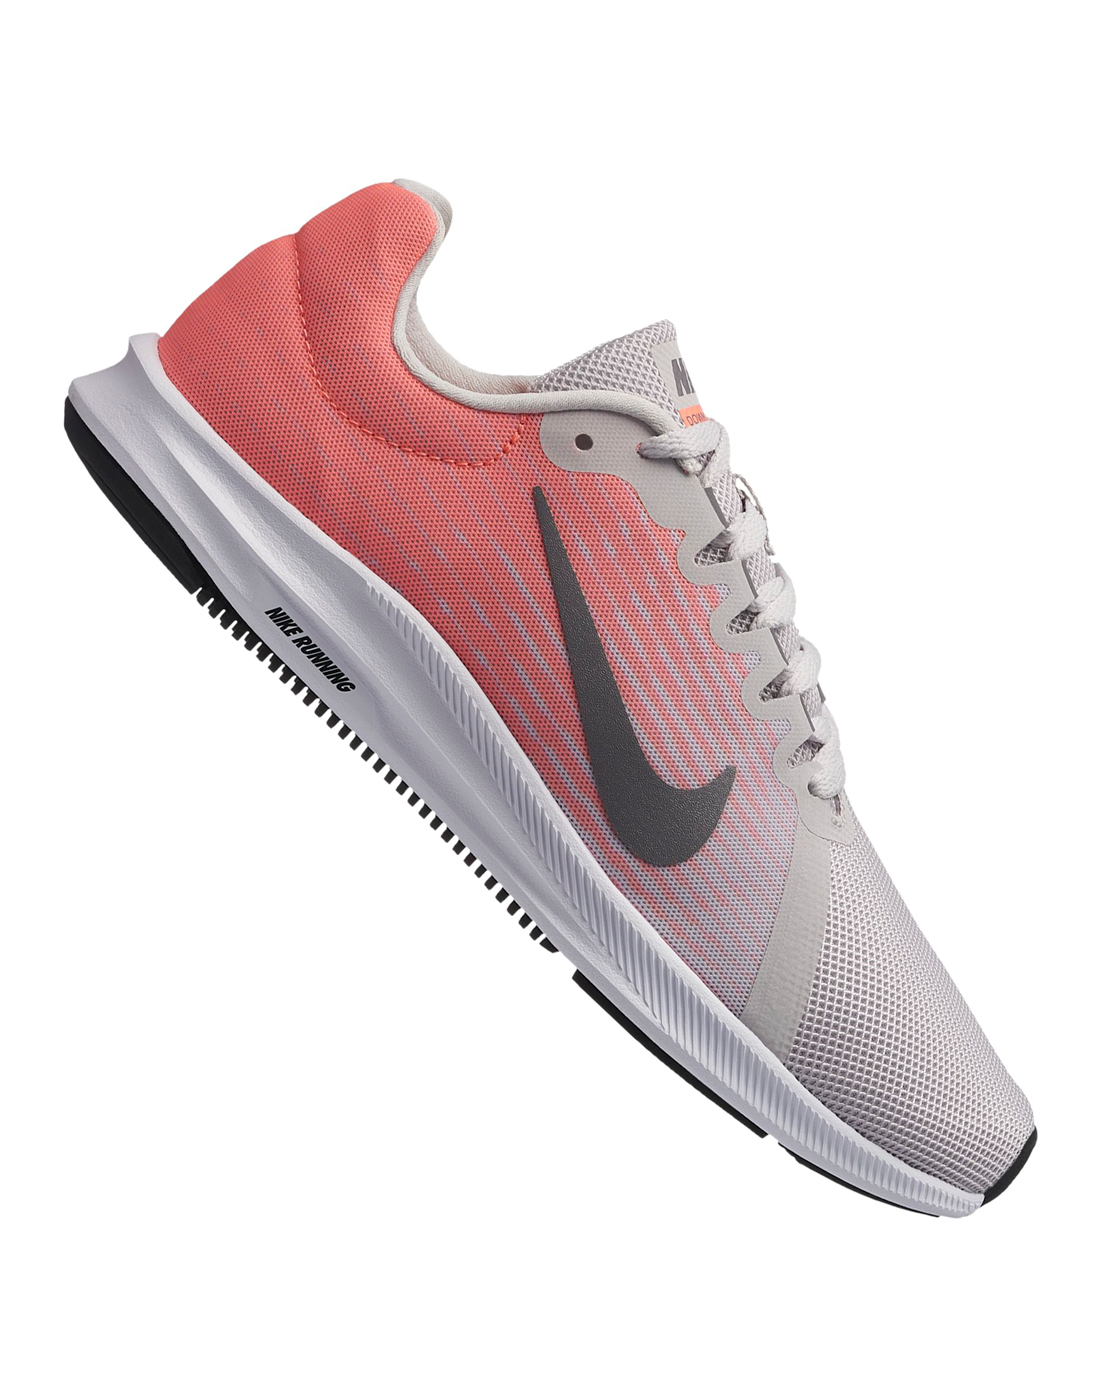 c65dcb2ef6e1 Nike Womens Downshifter 8